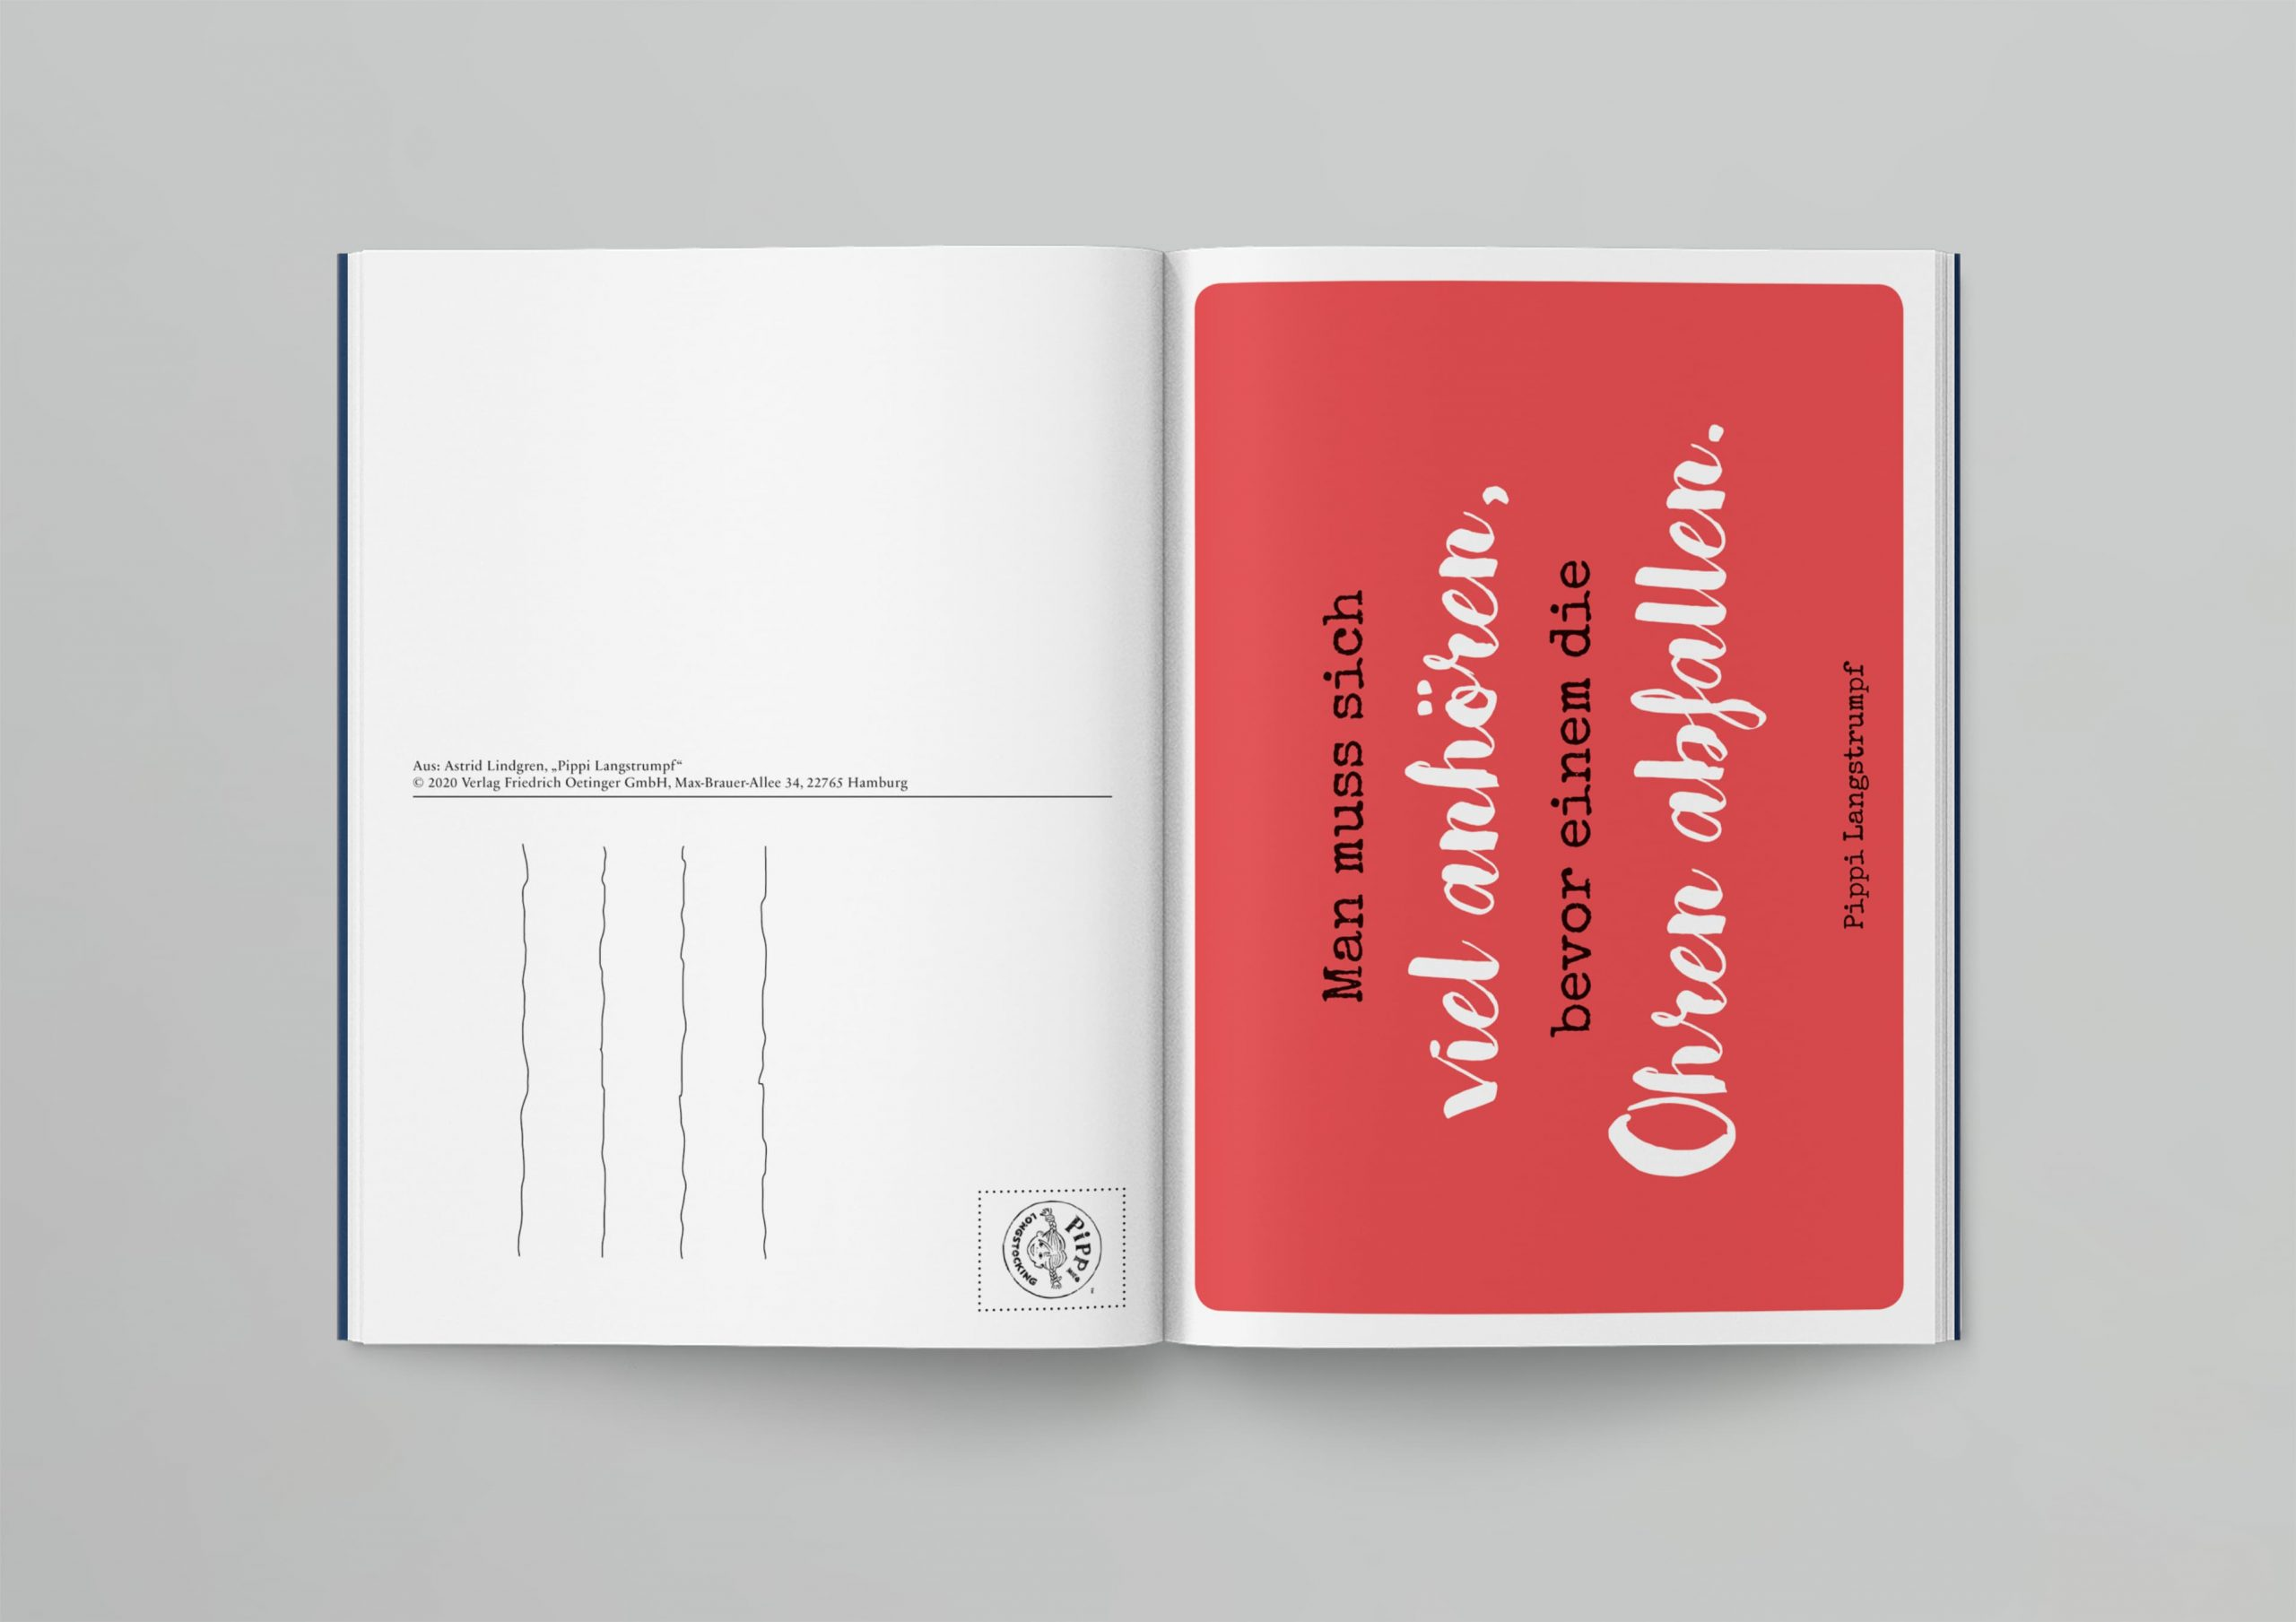 Oetinger-Pippi-Langstrumpf-Postkarten-IN04